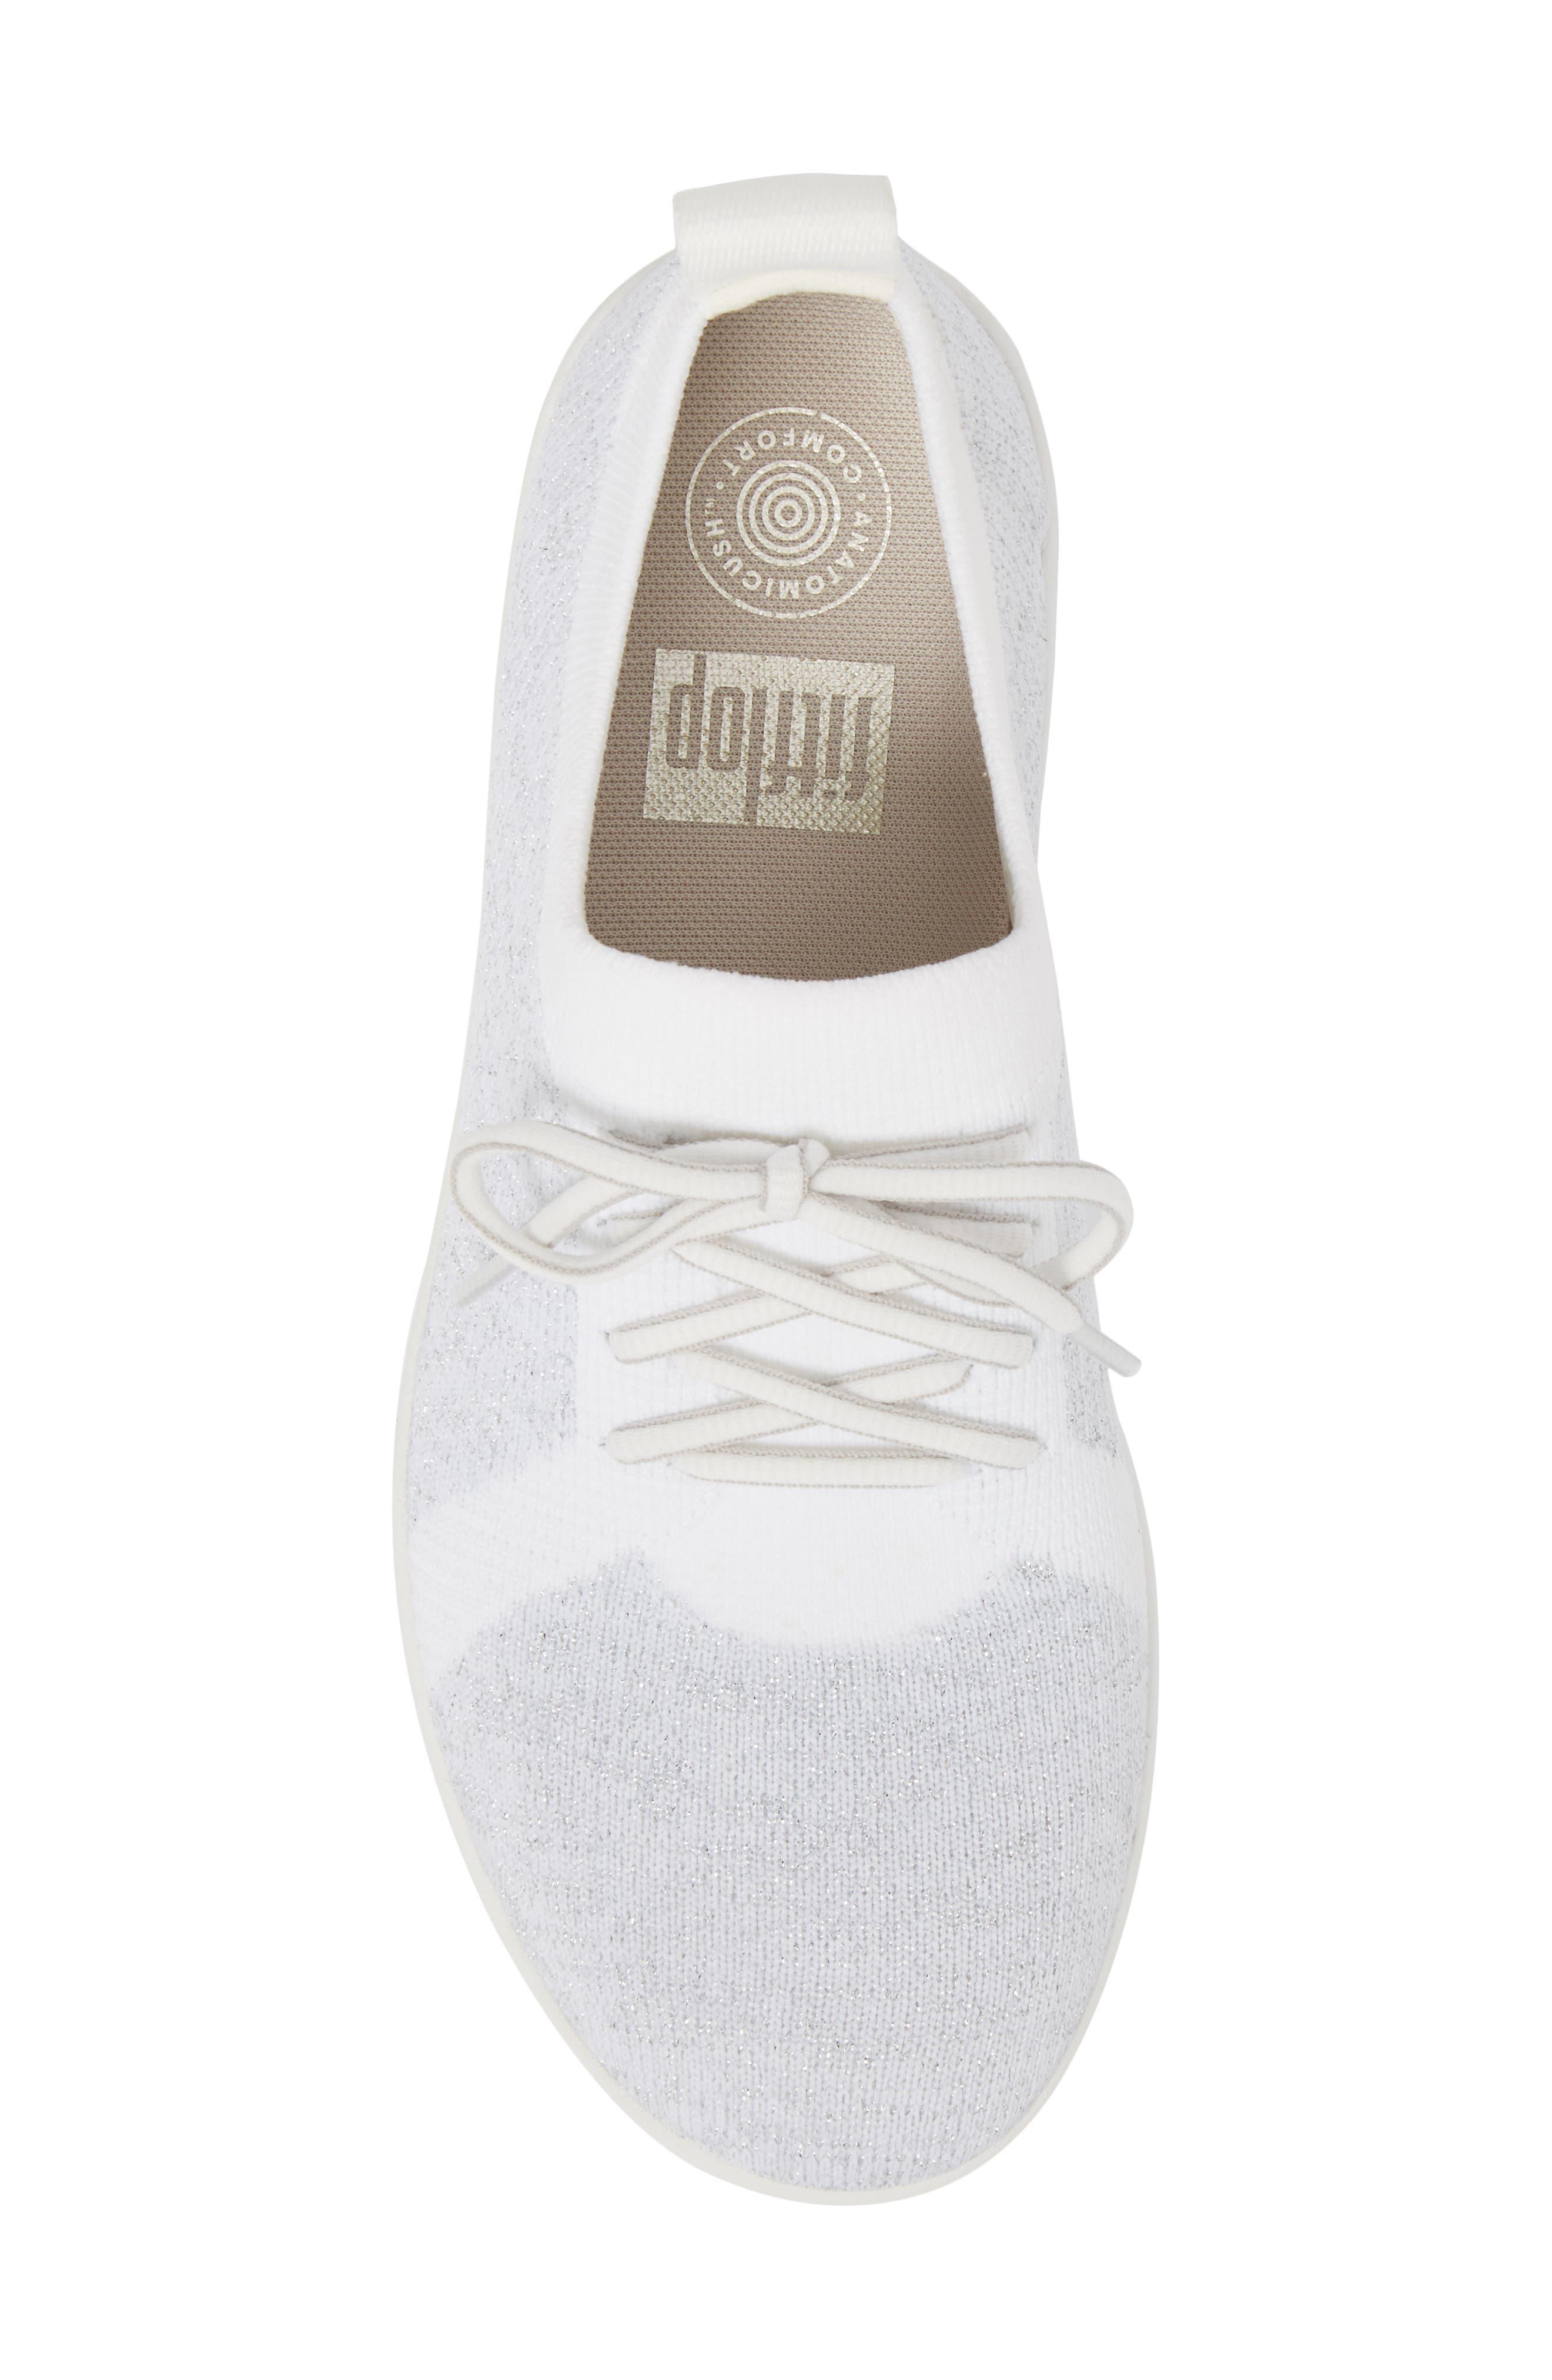 FITFLOP,                             Uberknit<sup>™</sup> F-Sporty Sneaker,                             Alternate thumbnail 5, color,                             METALLIC SILVER/ URBAN WHITE